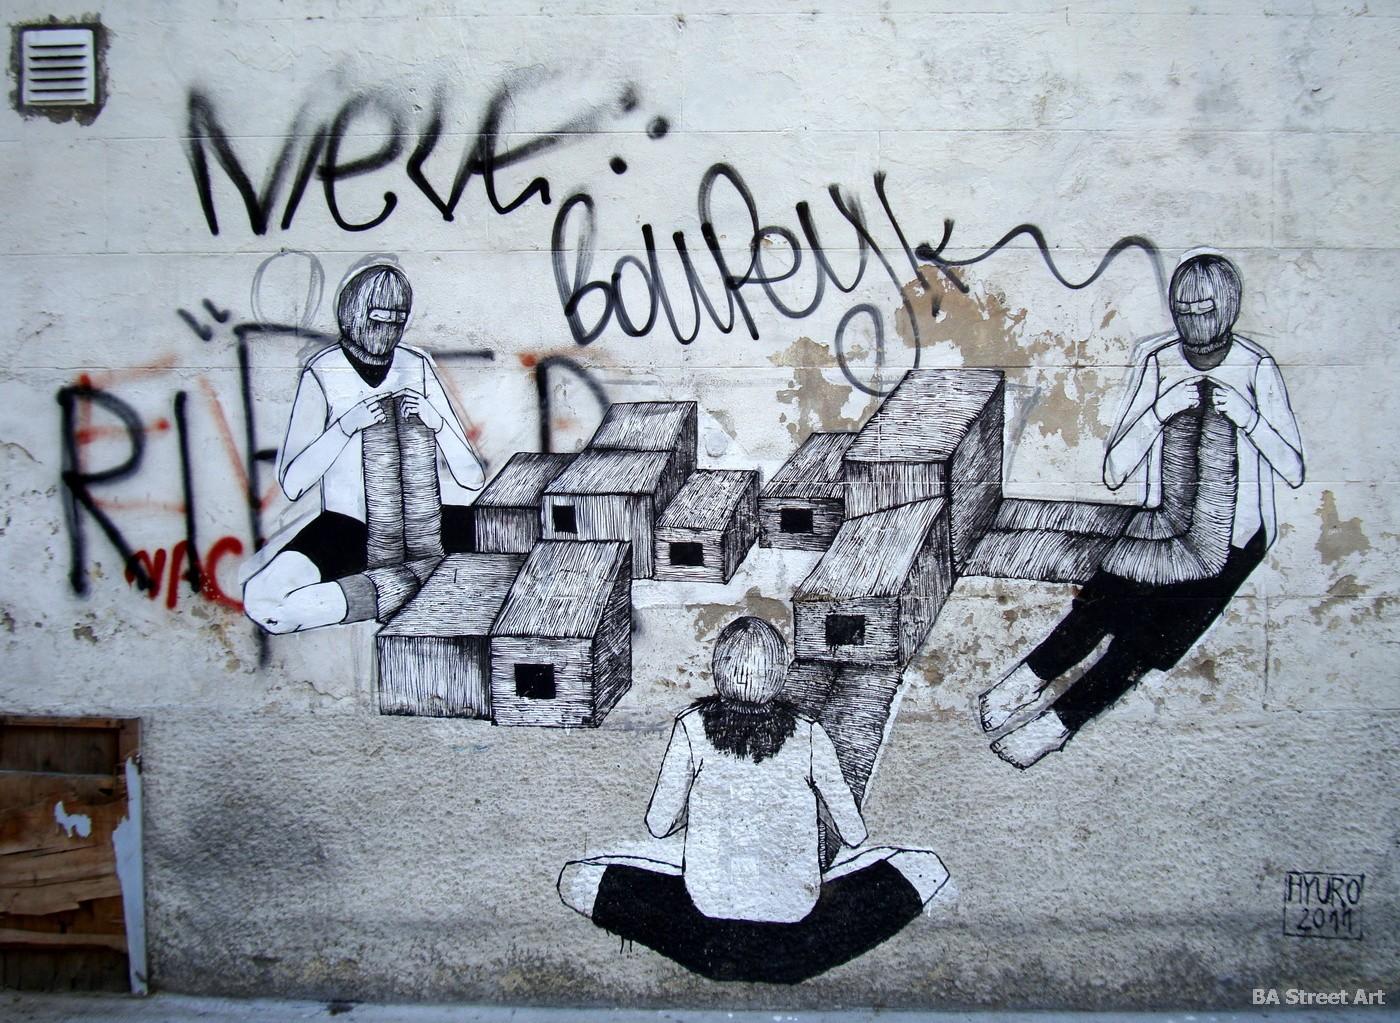 hyuro tamara djurovic artista murales argentina buenos aires arte urbano graffiti street art painter